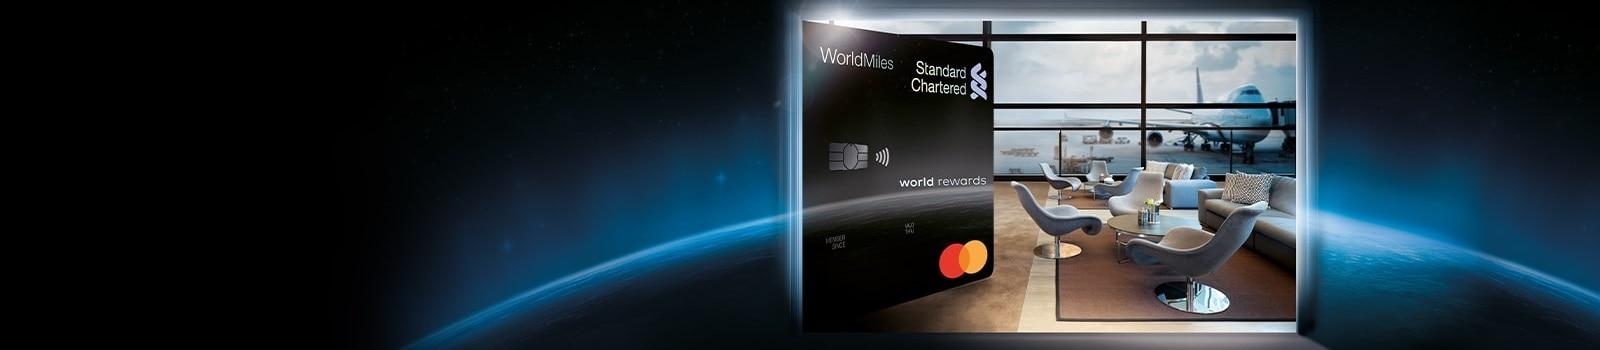 Priority WorldMiles Credit Card